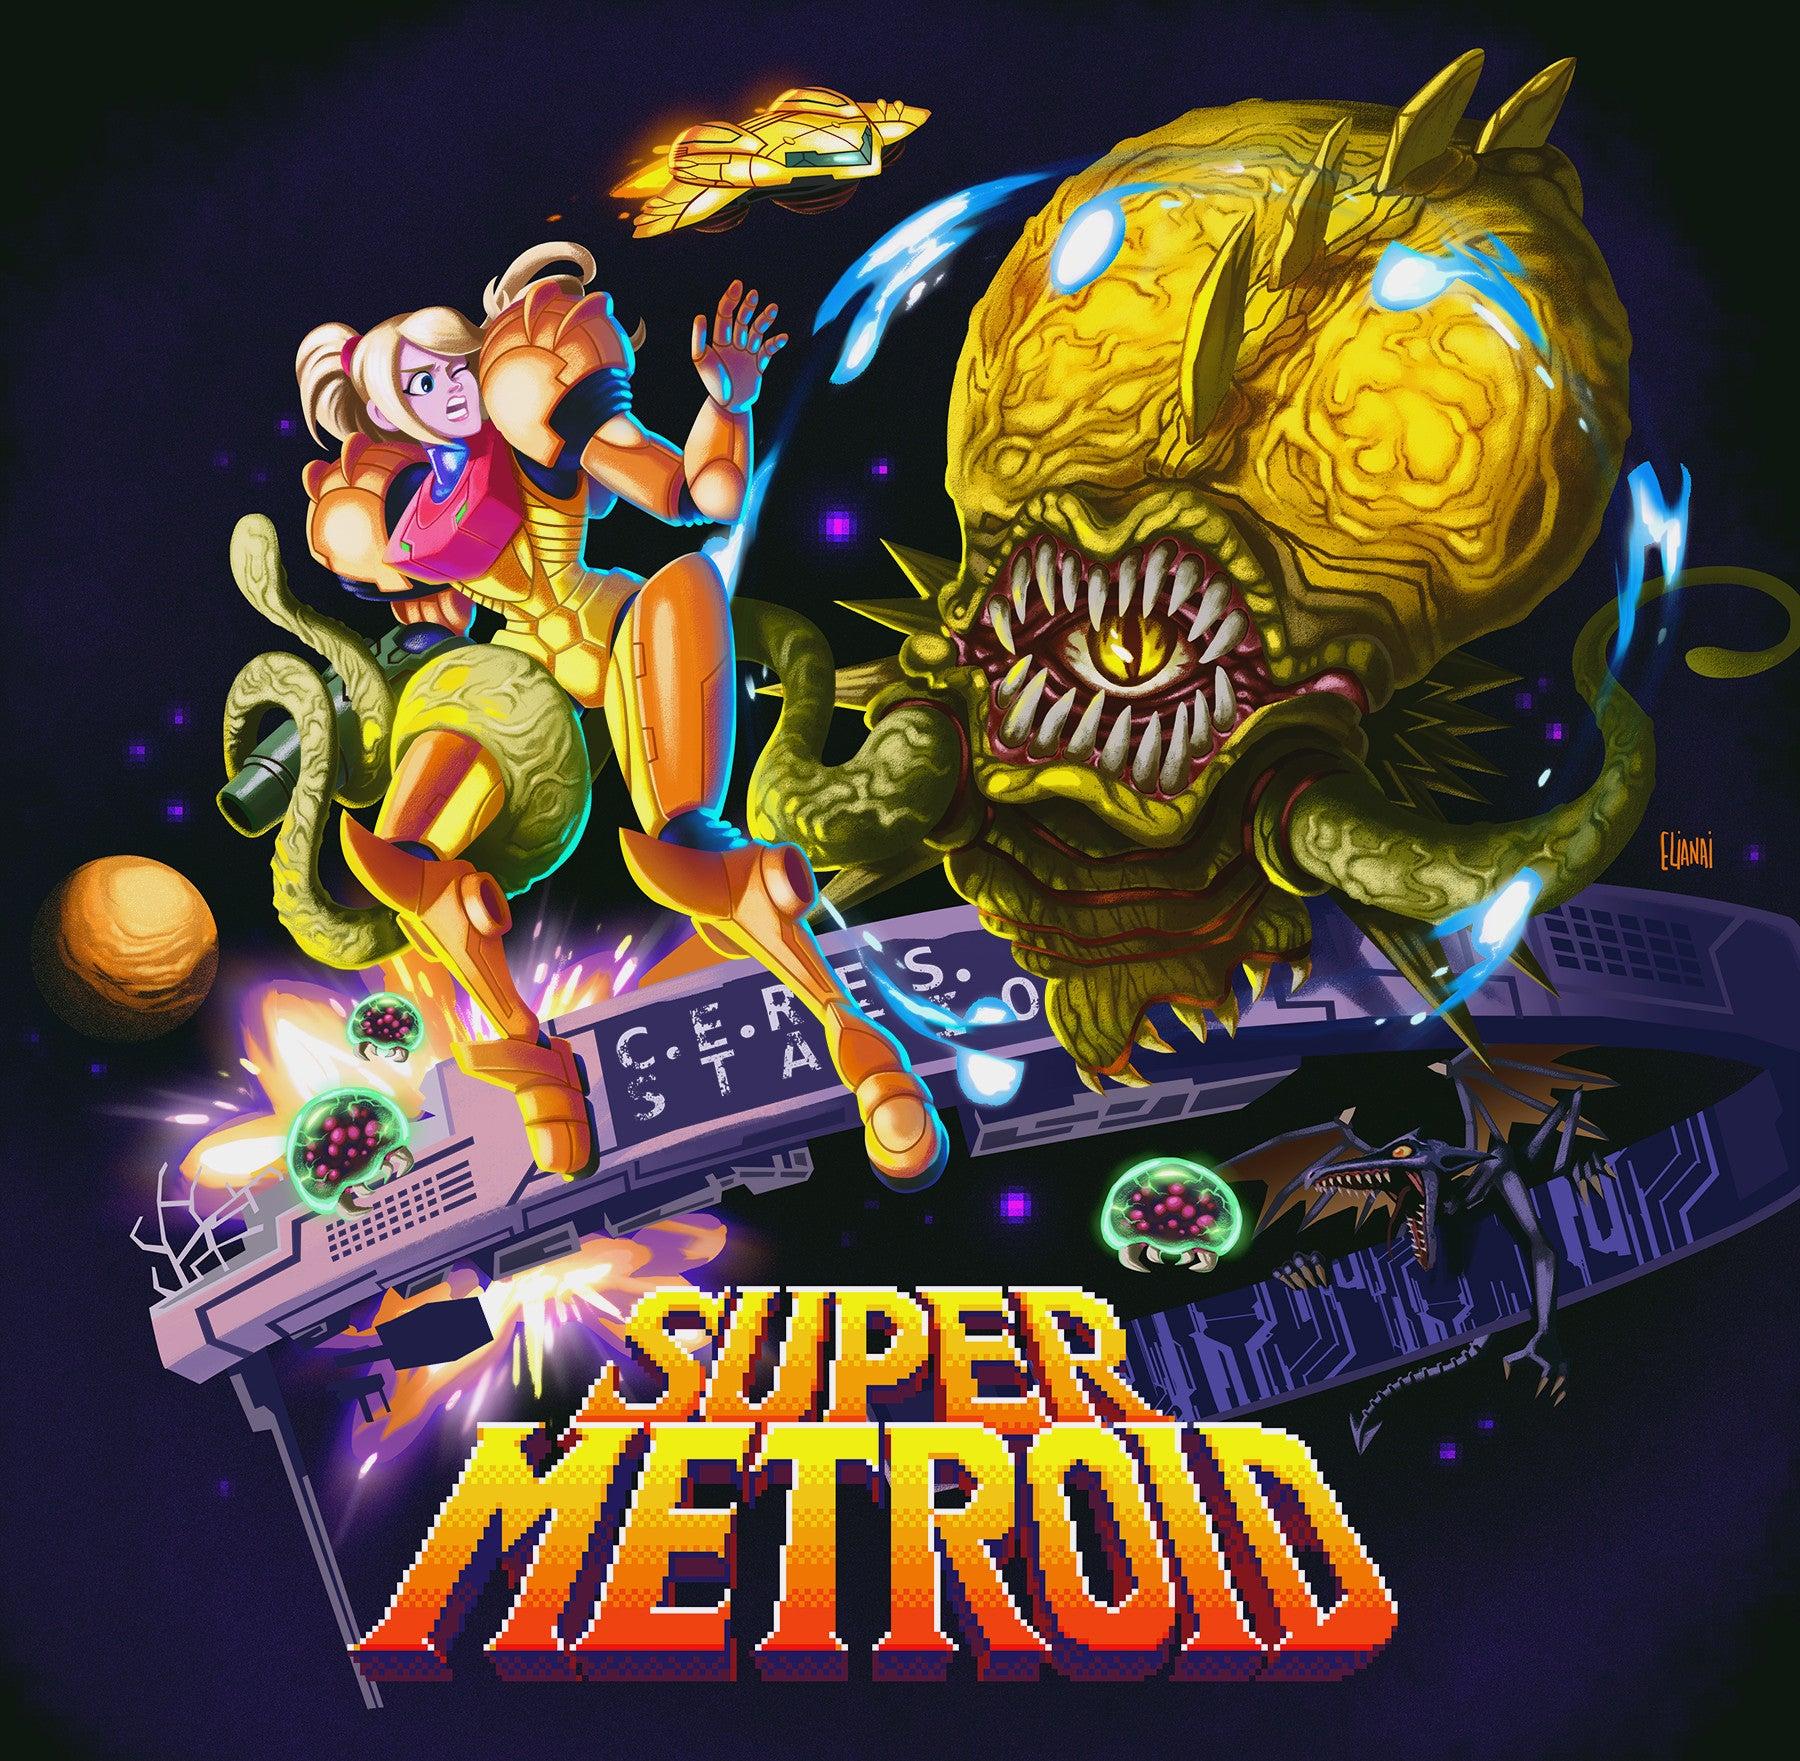 Super Metroid As a 90s Saturday Morning Cartoon